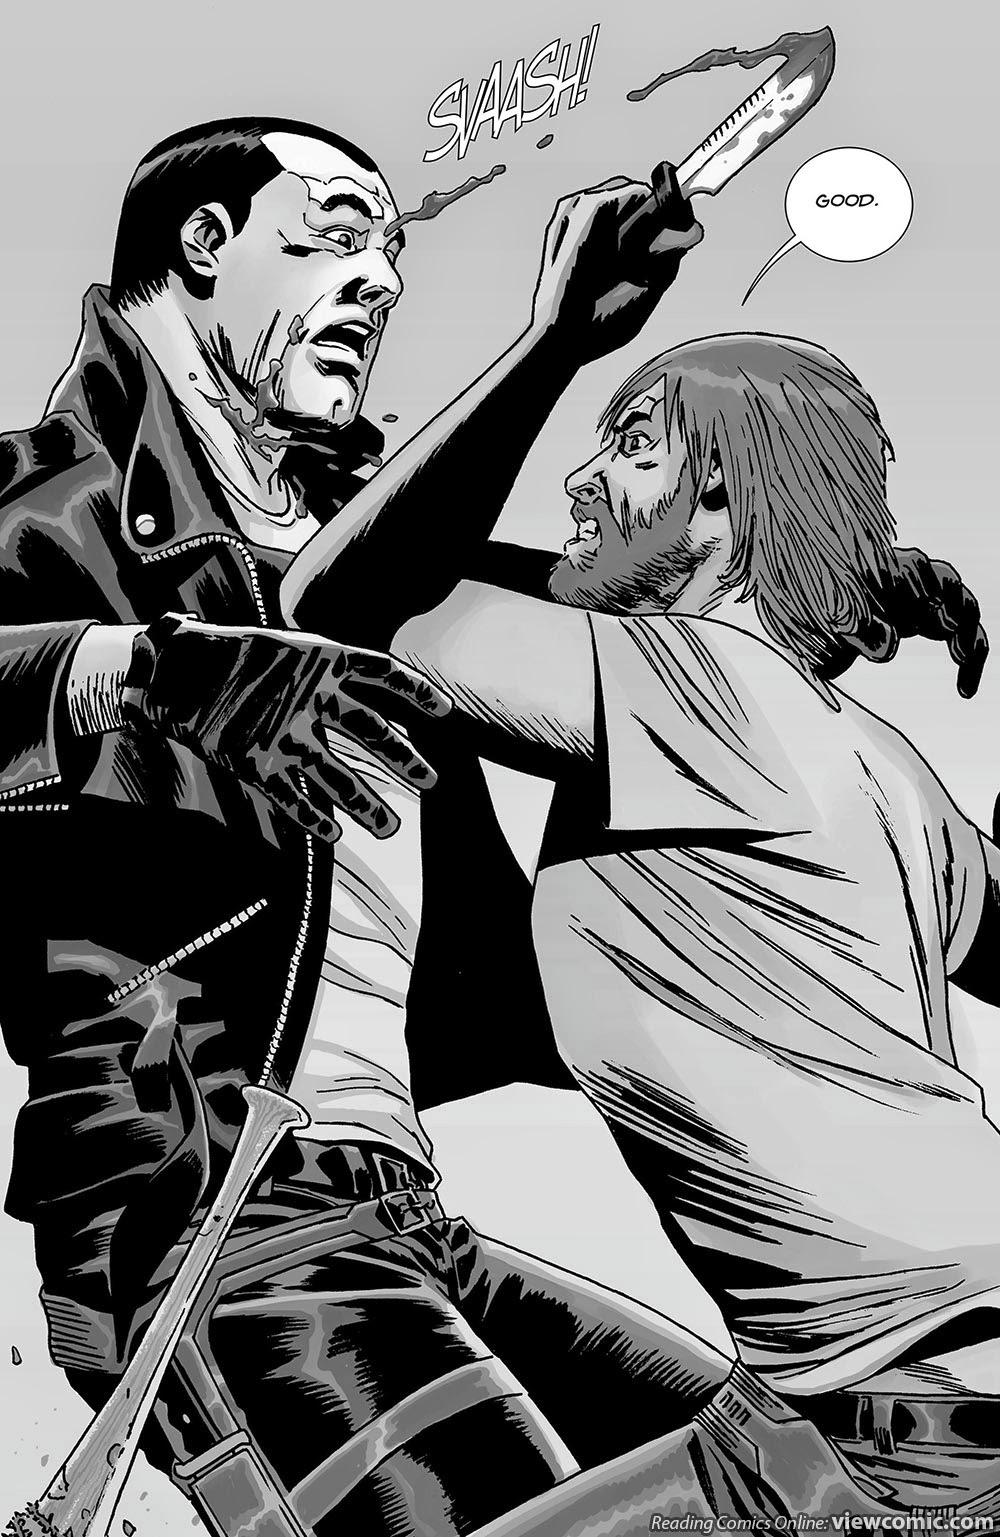 Walking dead | Viewcomic reading comics online for free 2019